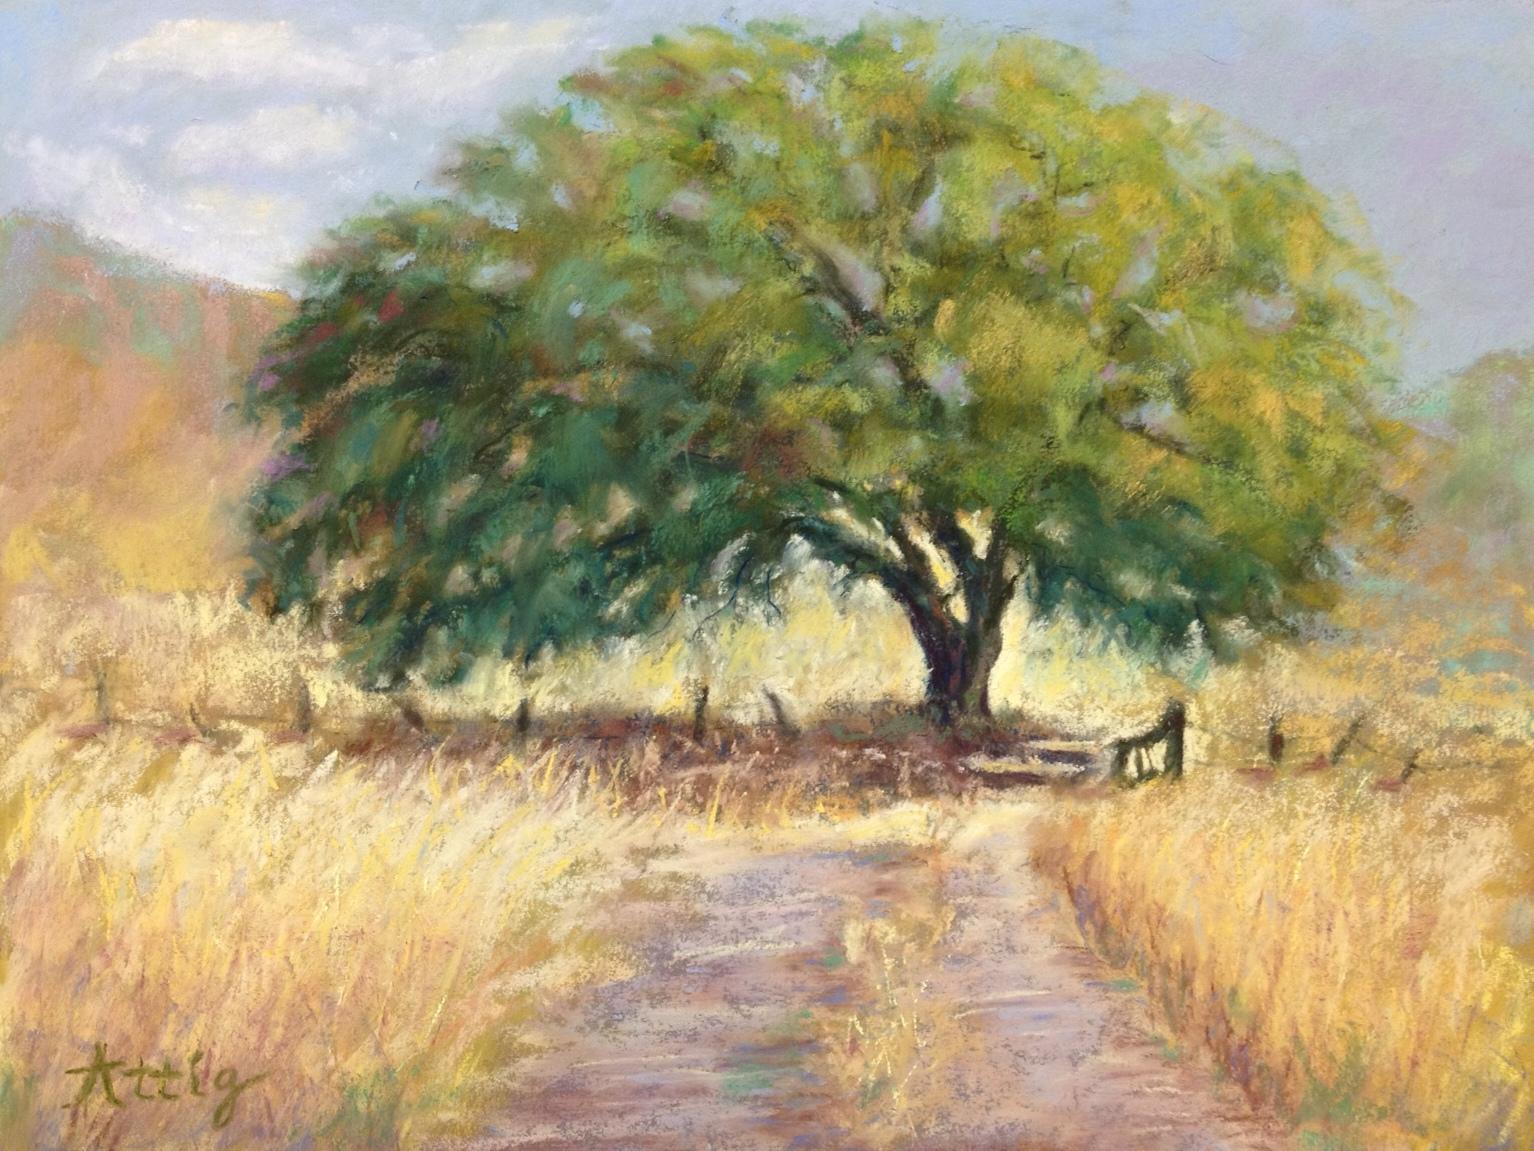 """Ruiz Field Giant Oak"" 9"" x 12"" $495"